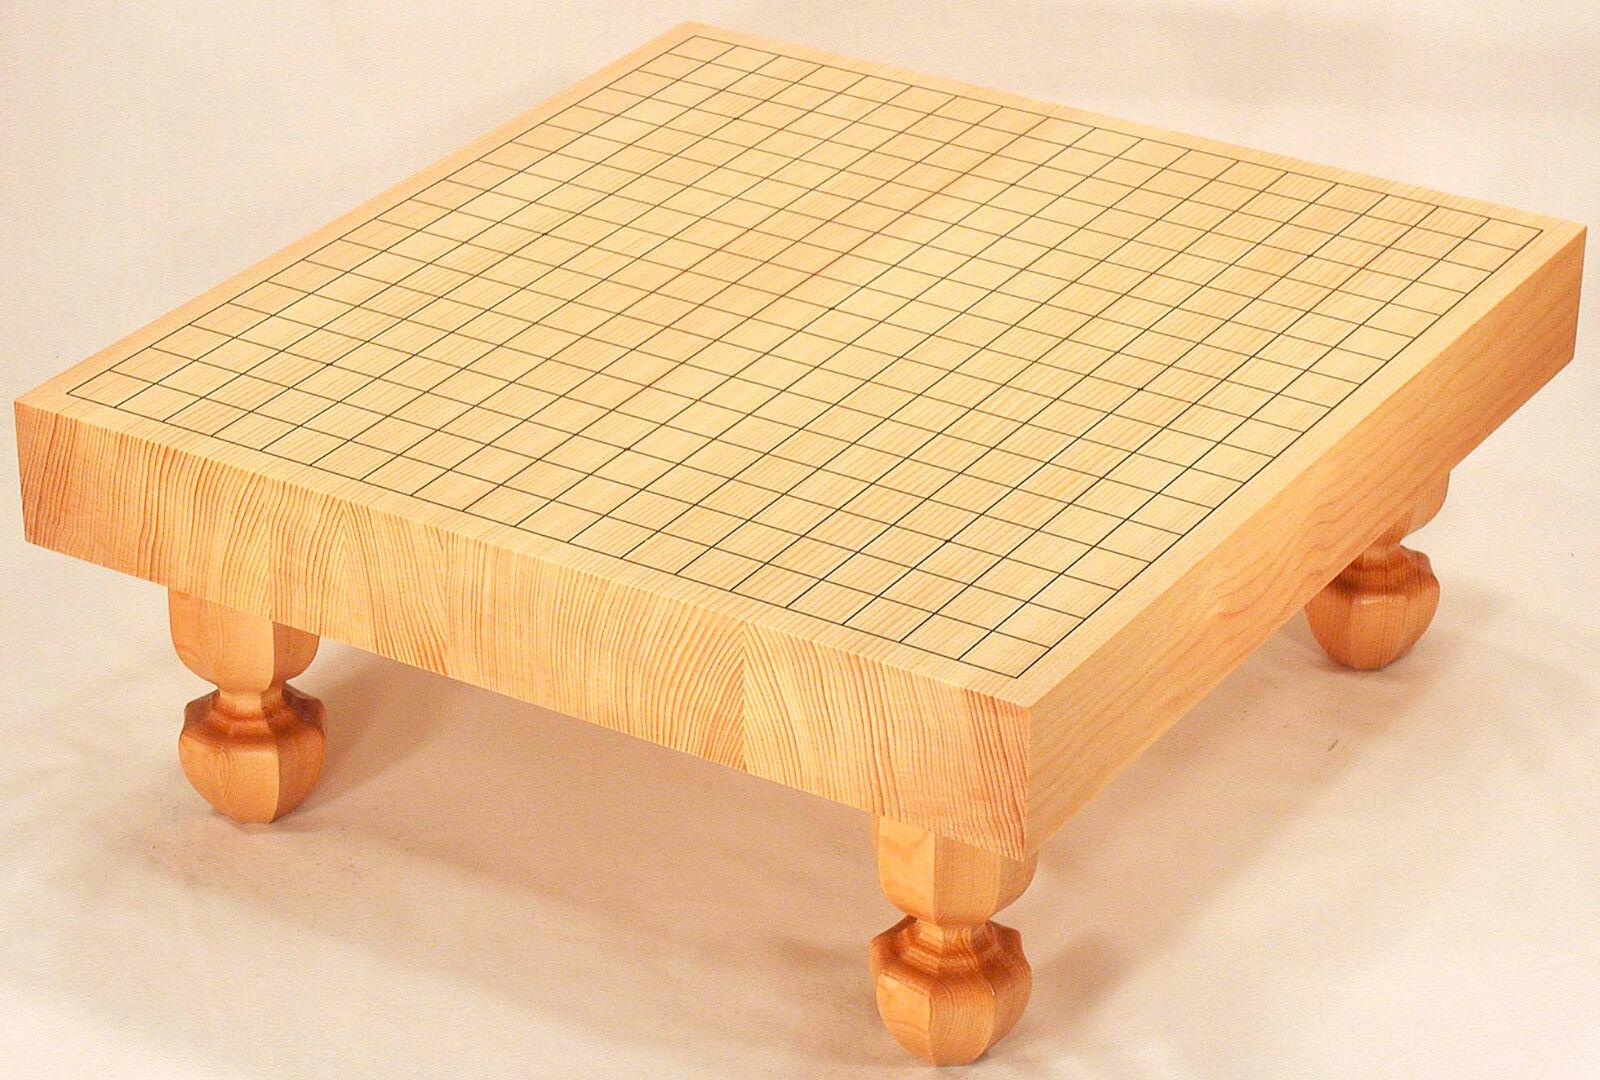 Japanese Japanese Japanese Game of  Go  Goban Kaya Board with Legs Igo High Quality 2-sun 6cm d06859